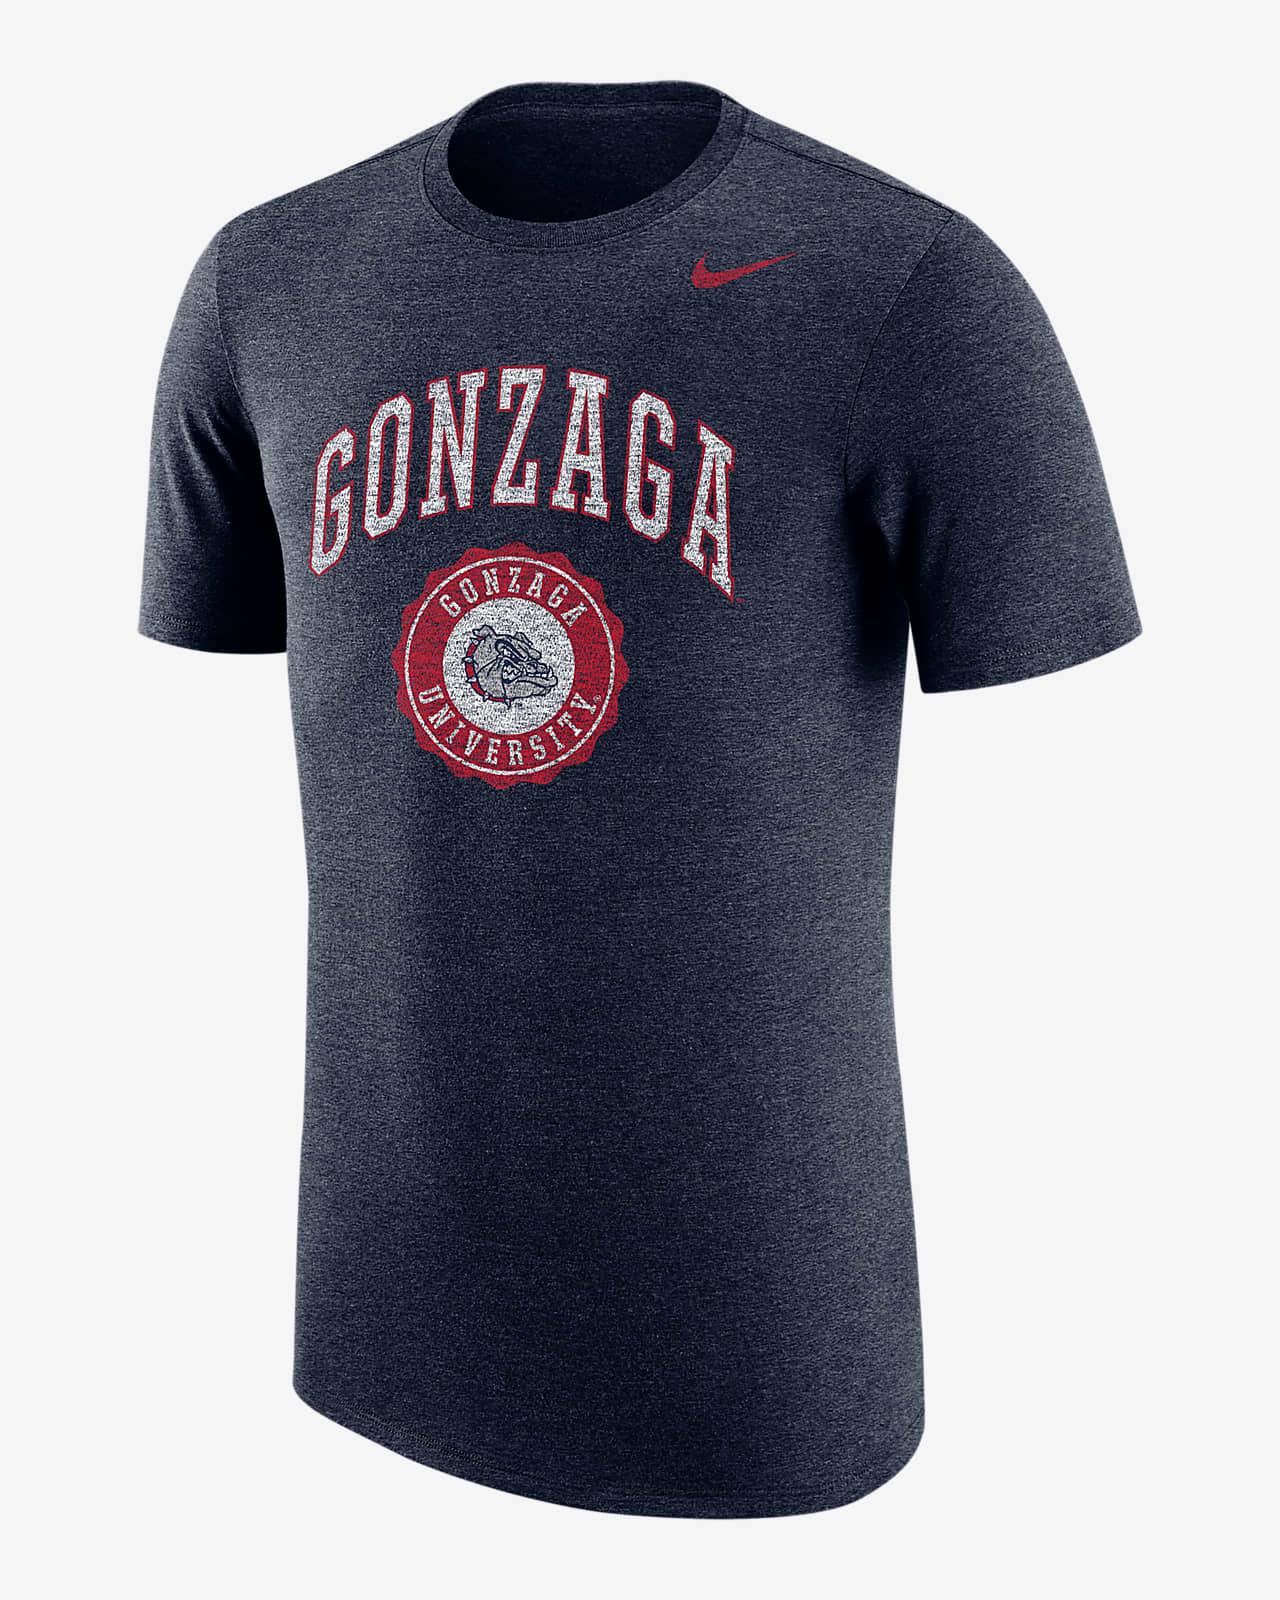 Nike College (Gonzaga) Men's T-Shirt